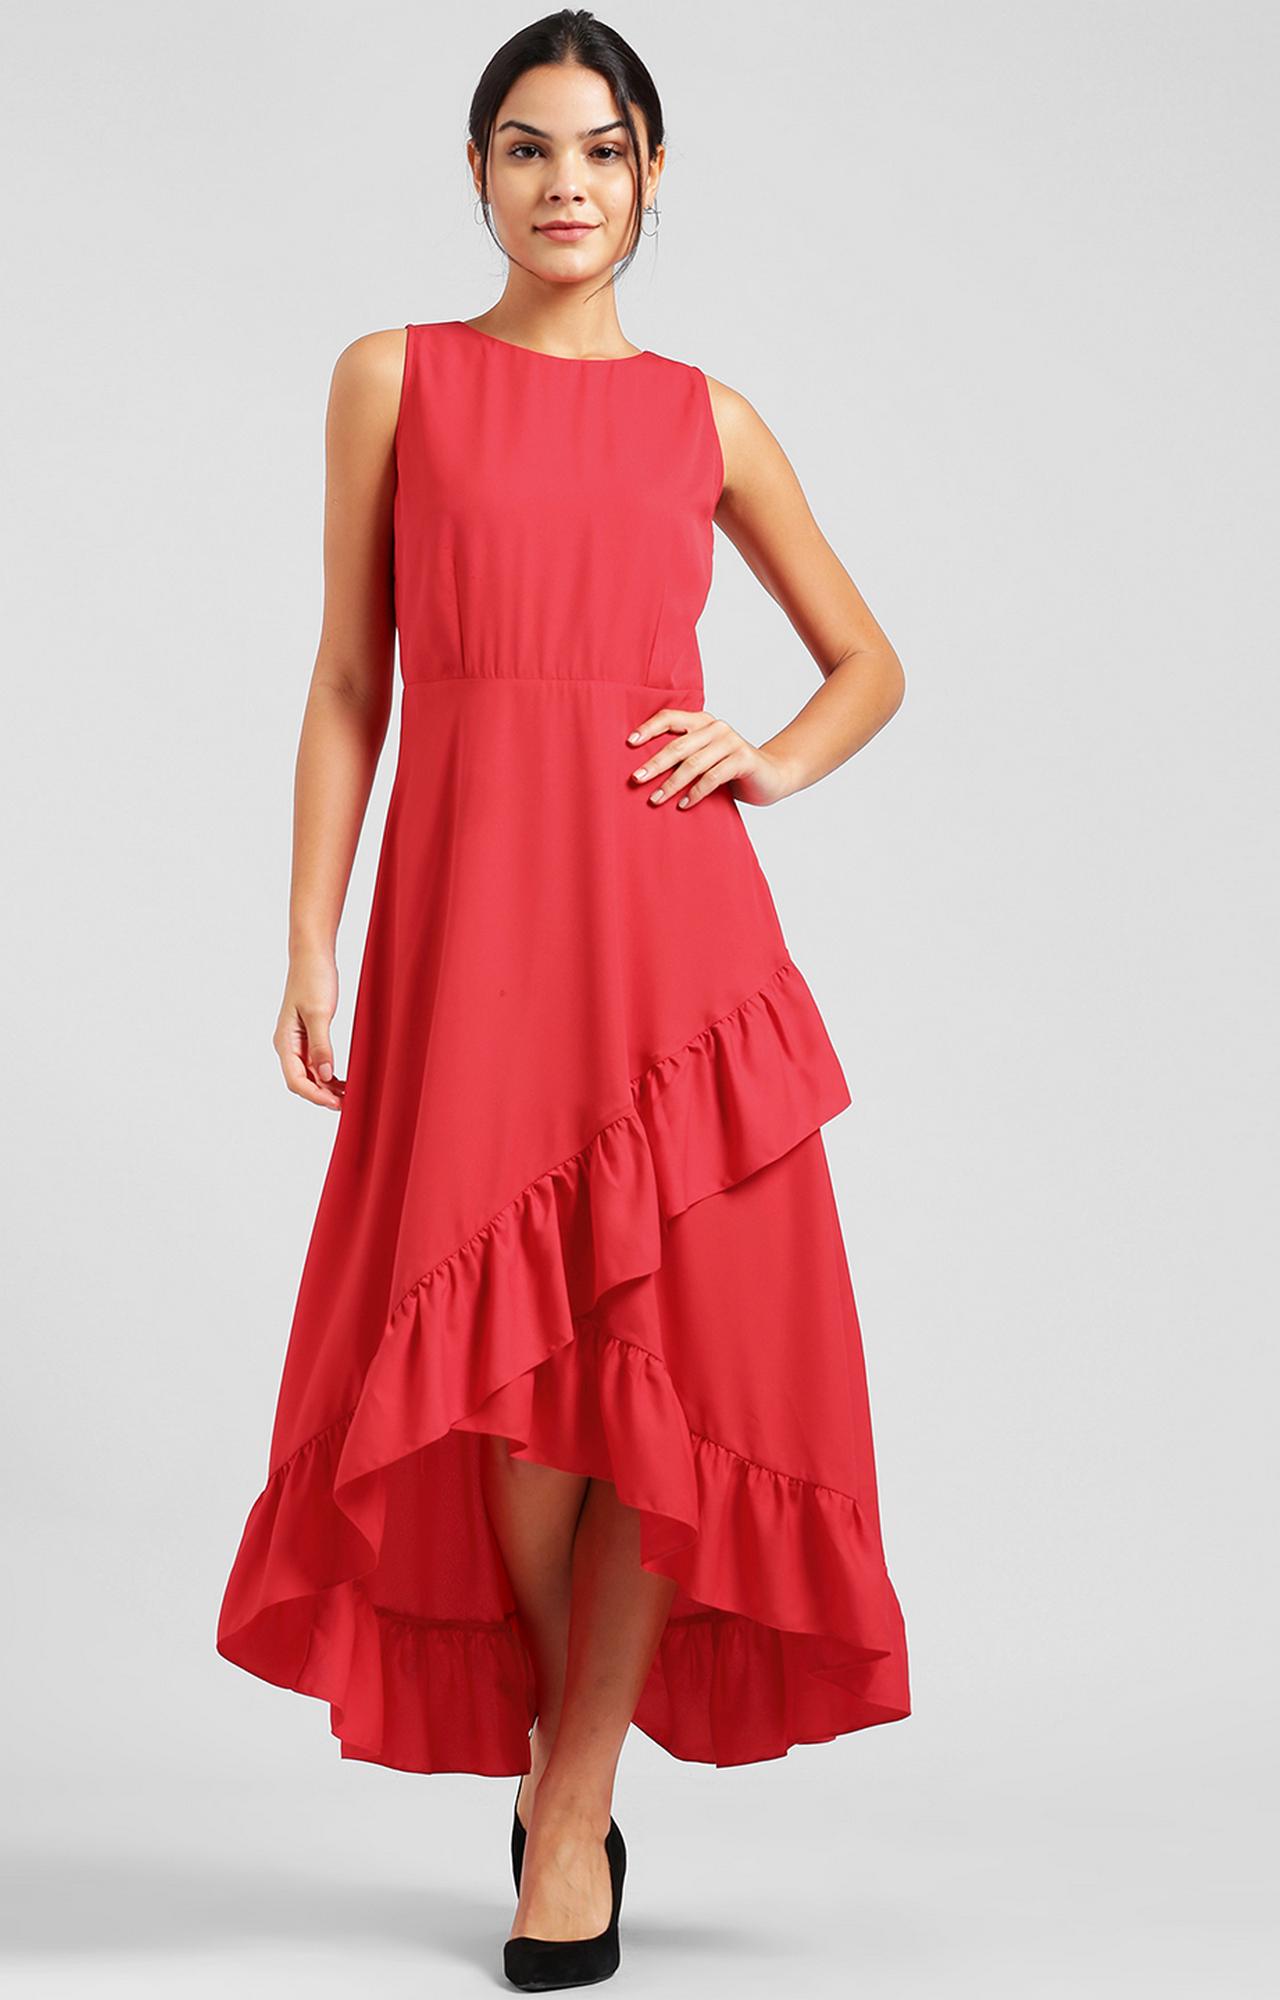 Zink London | Red Solid Asymmetric Dress